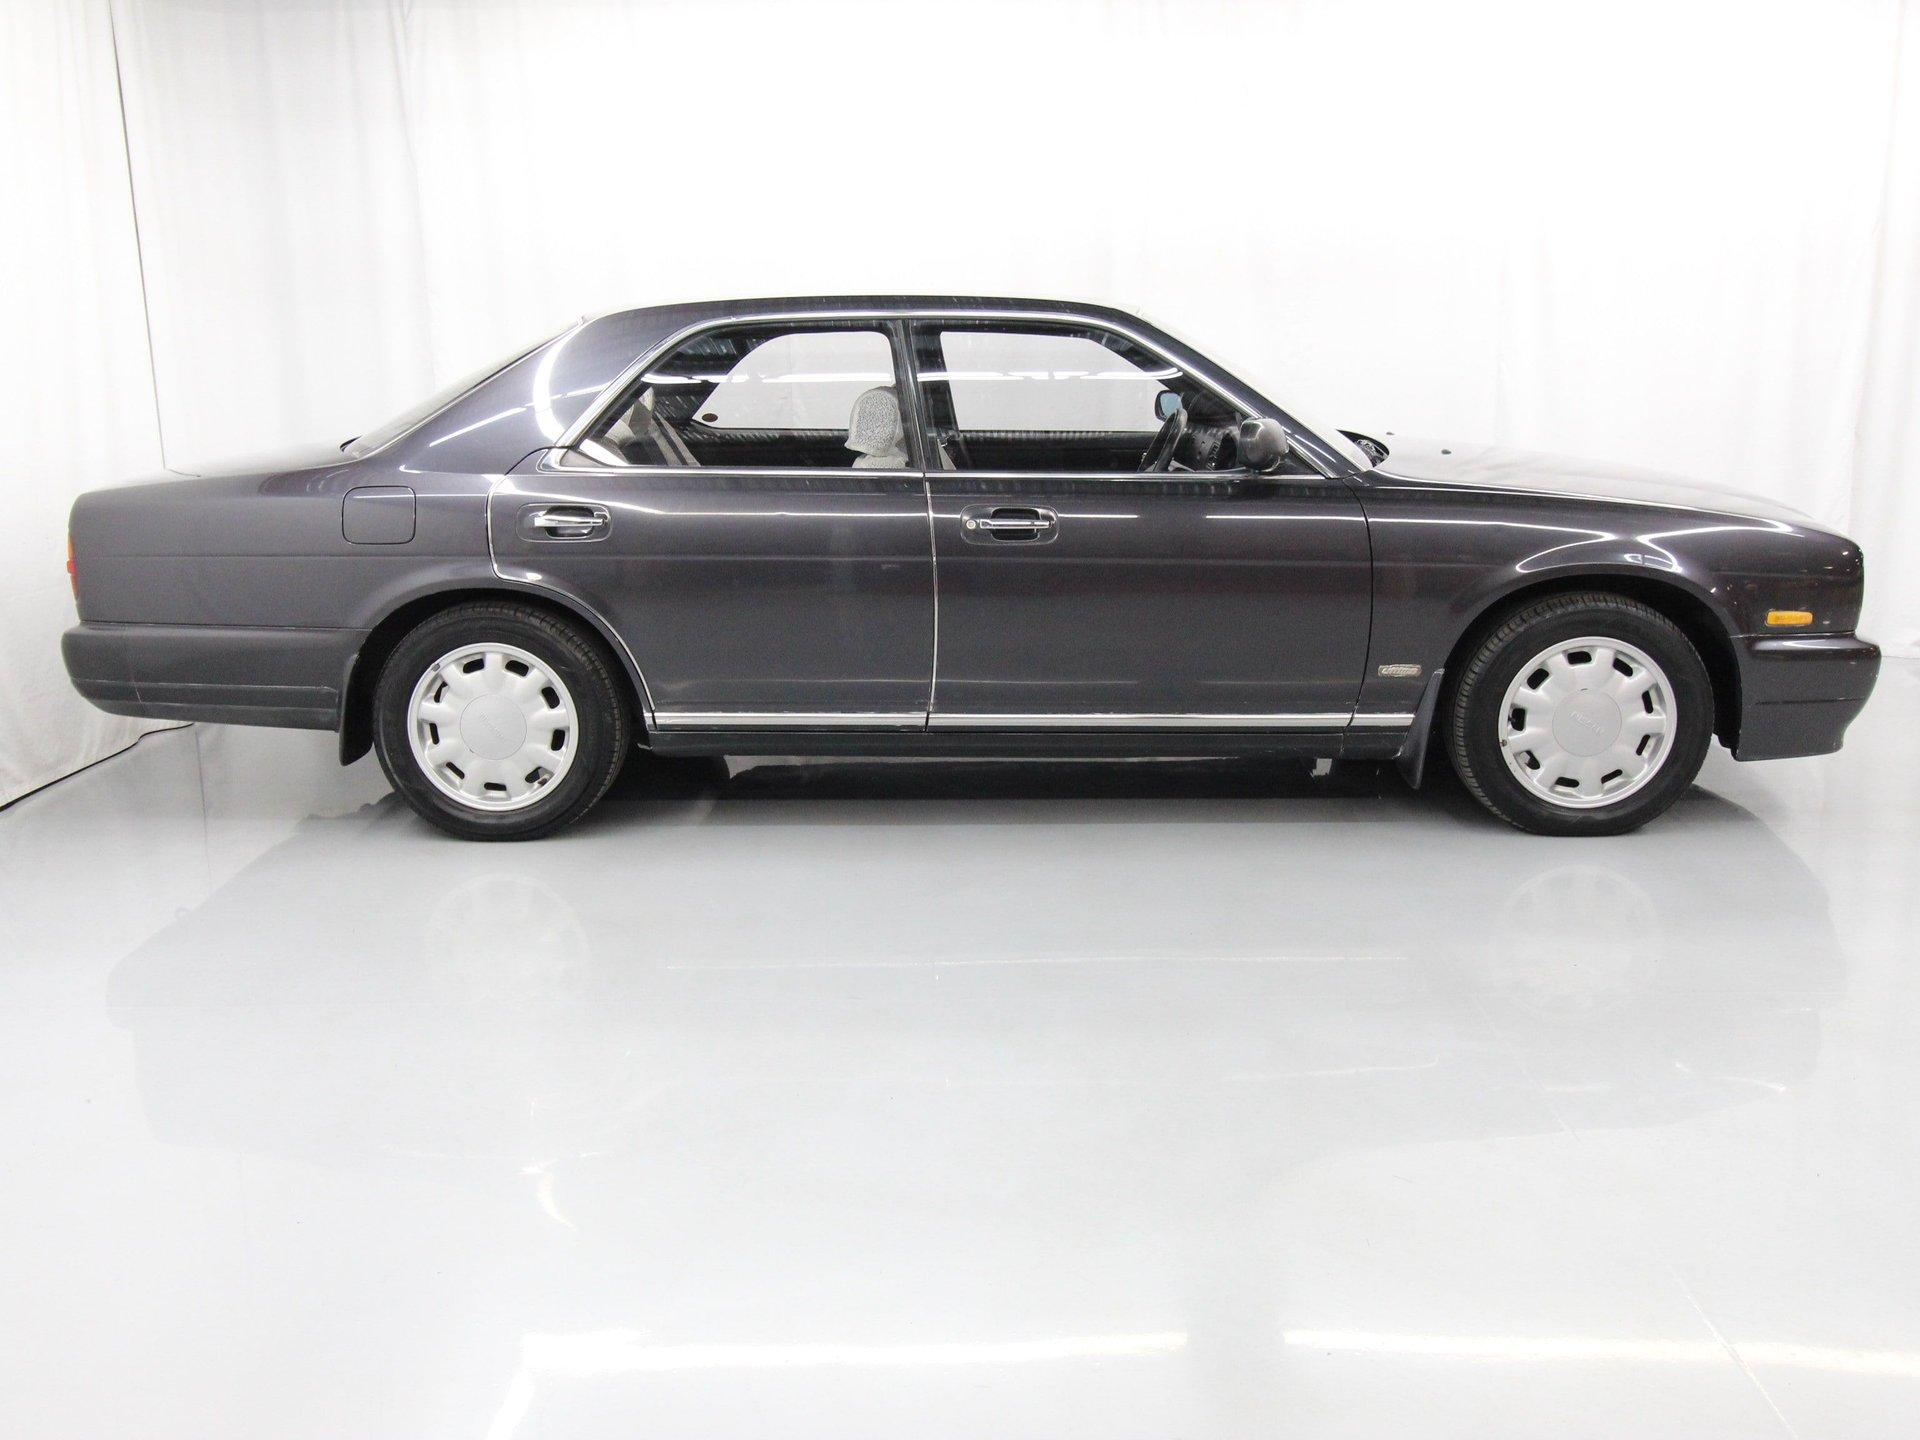 1991 Nissan Gloria